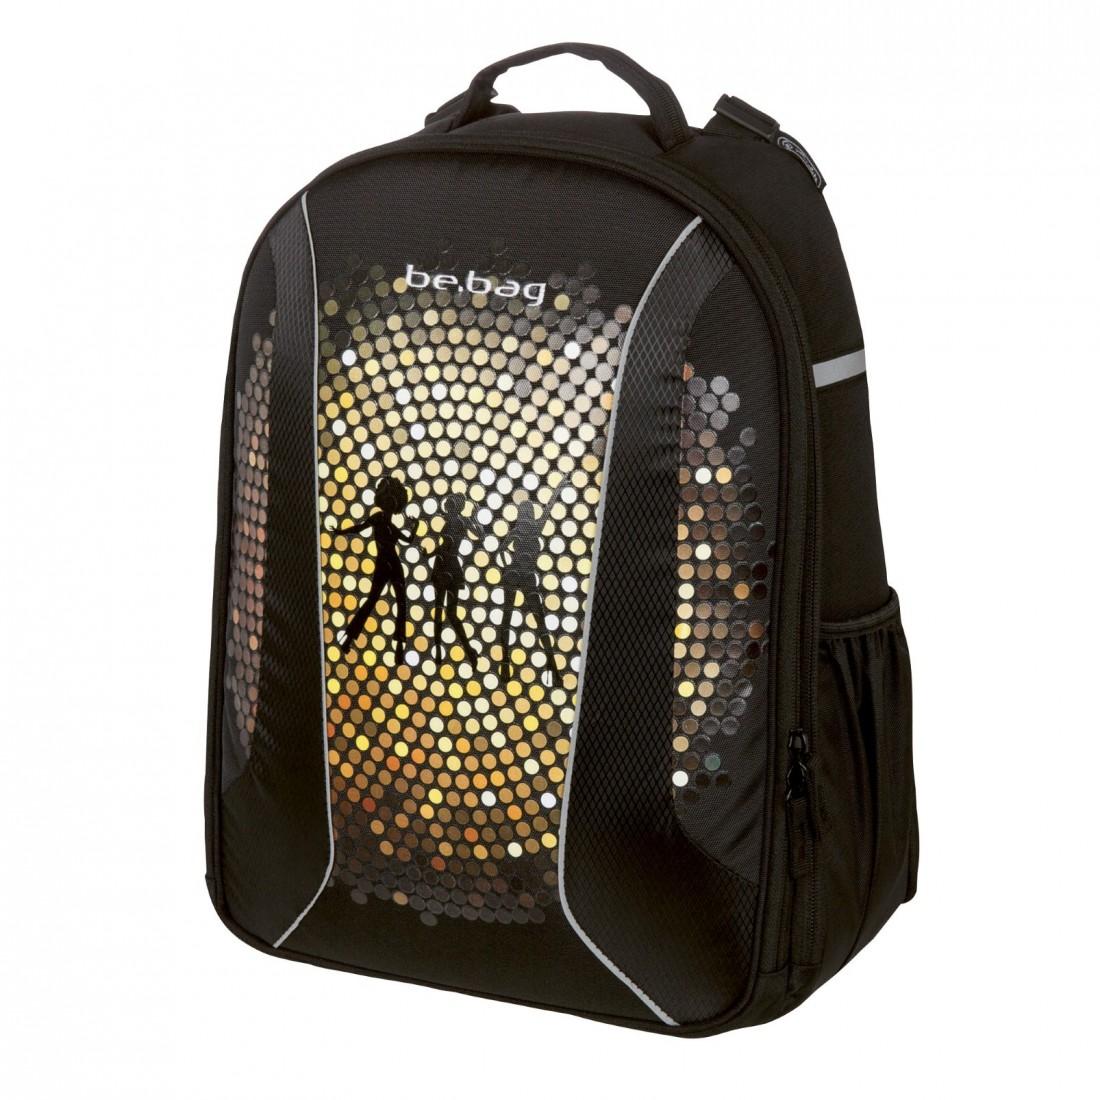 PLECAK be.bag AIRGO DANCE Disco - plecak-tornister.pl